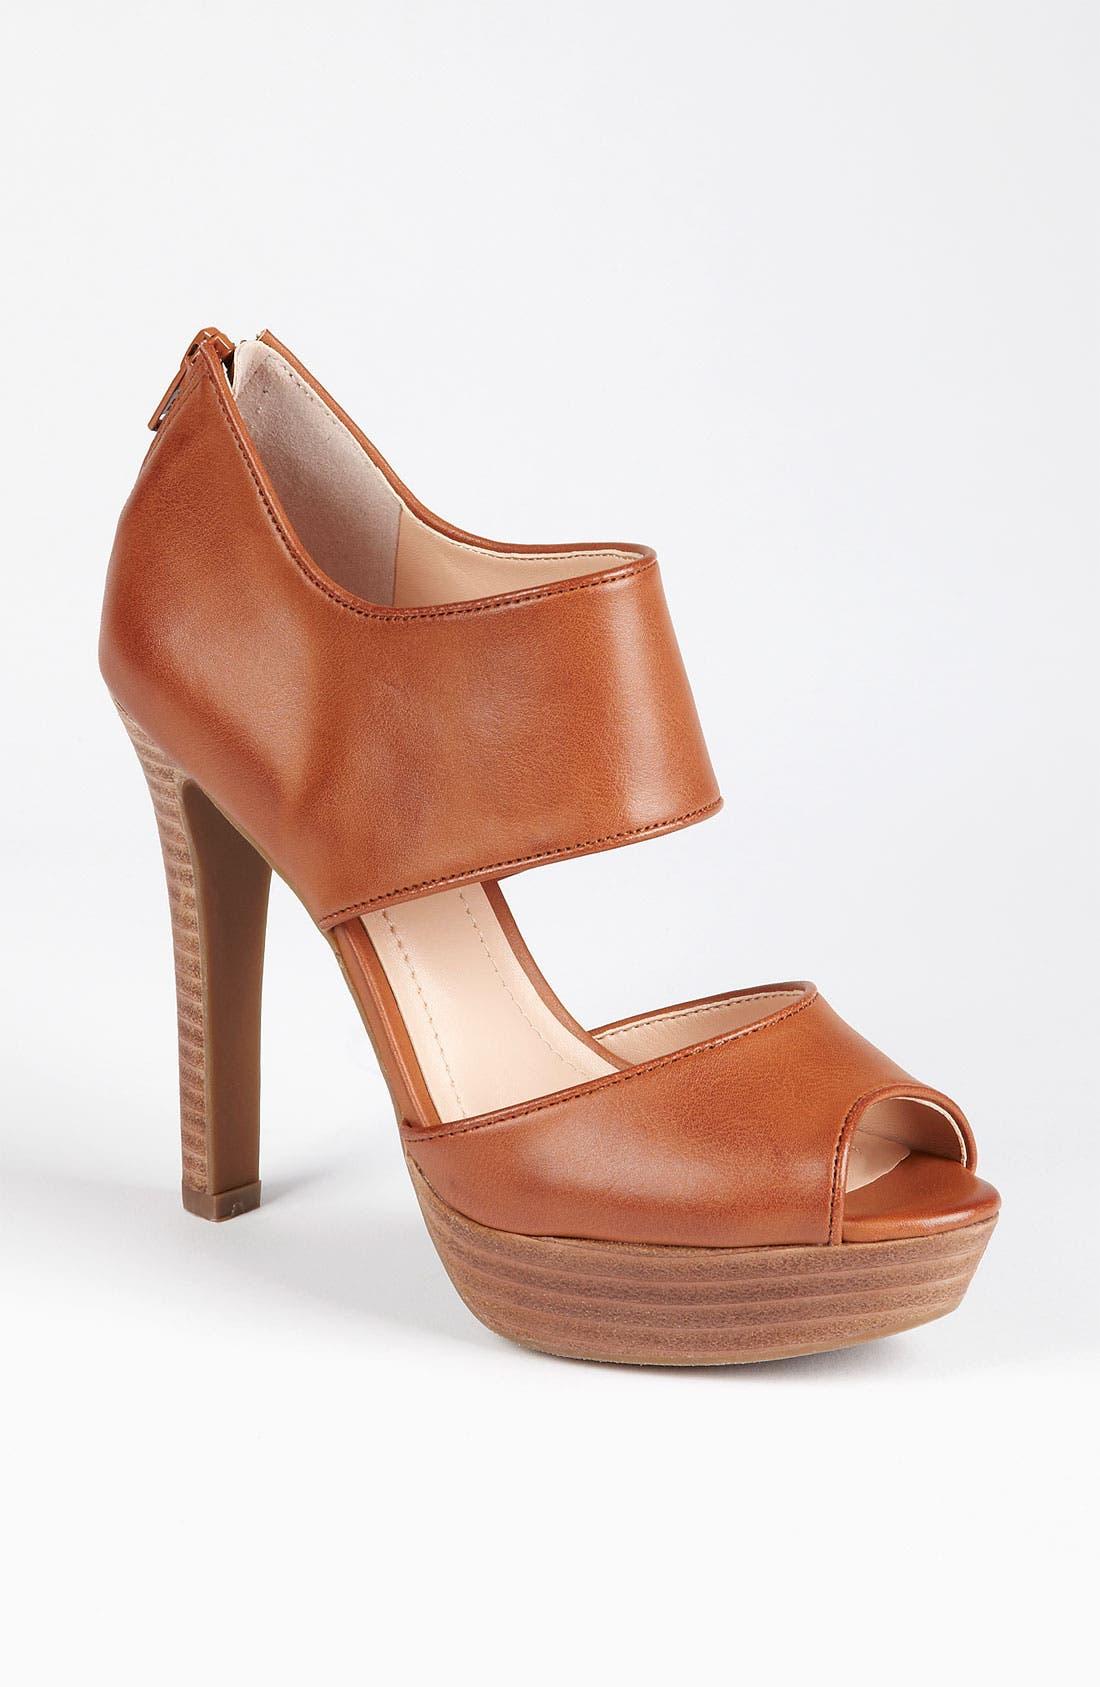 Main Image - Sole Society 'Karissa' Sandal